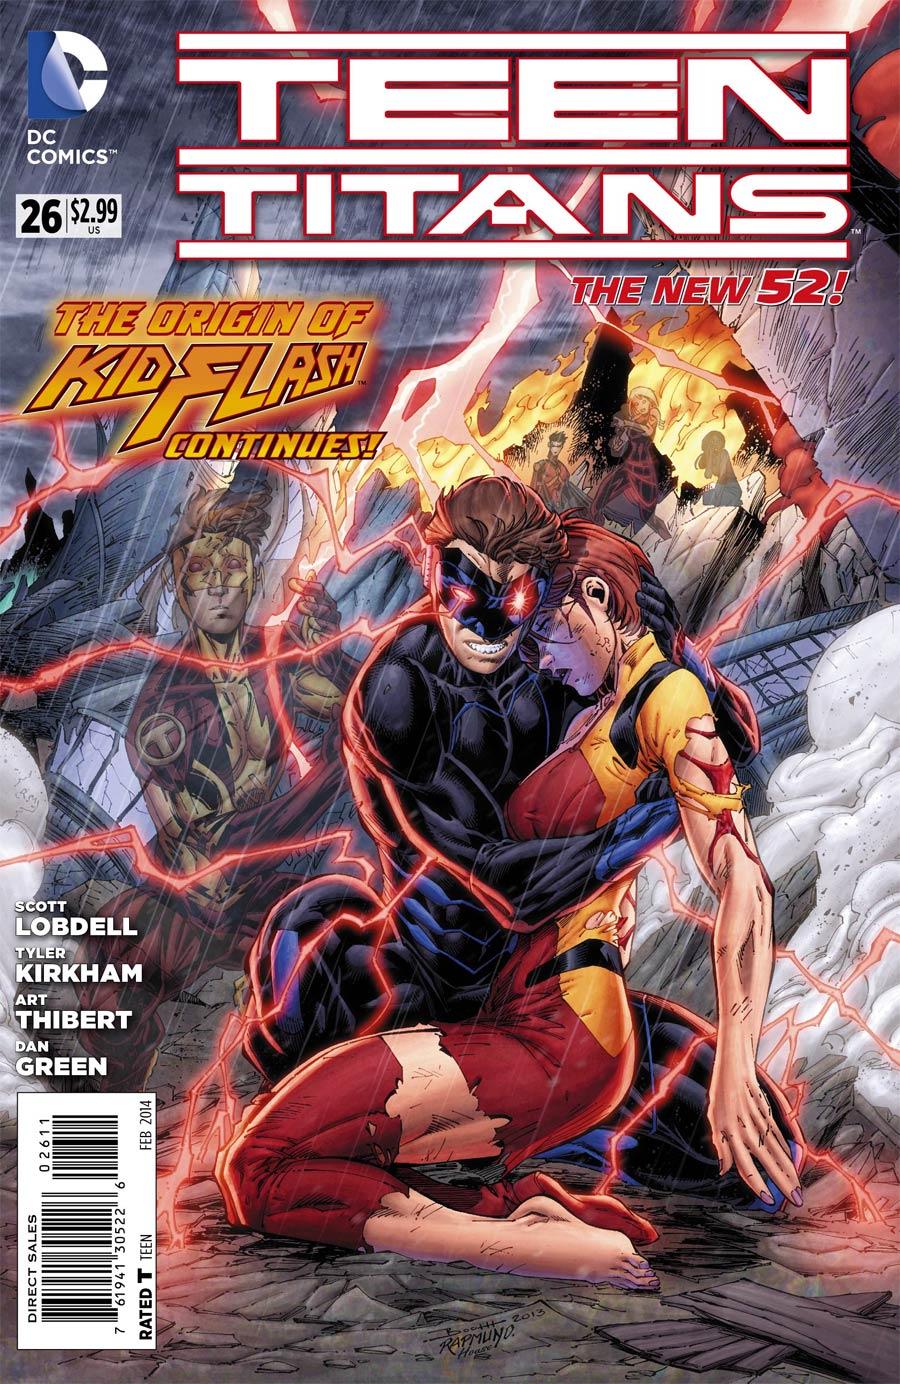 Teen Titans Vol 4 #26 Cover A Regular Brett Booth Cover (Forever Evil Tie-In)